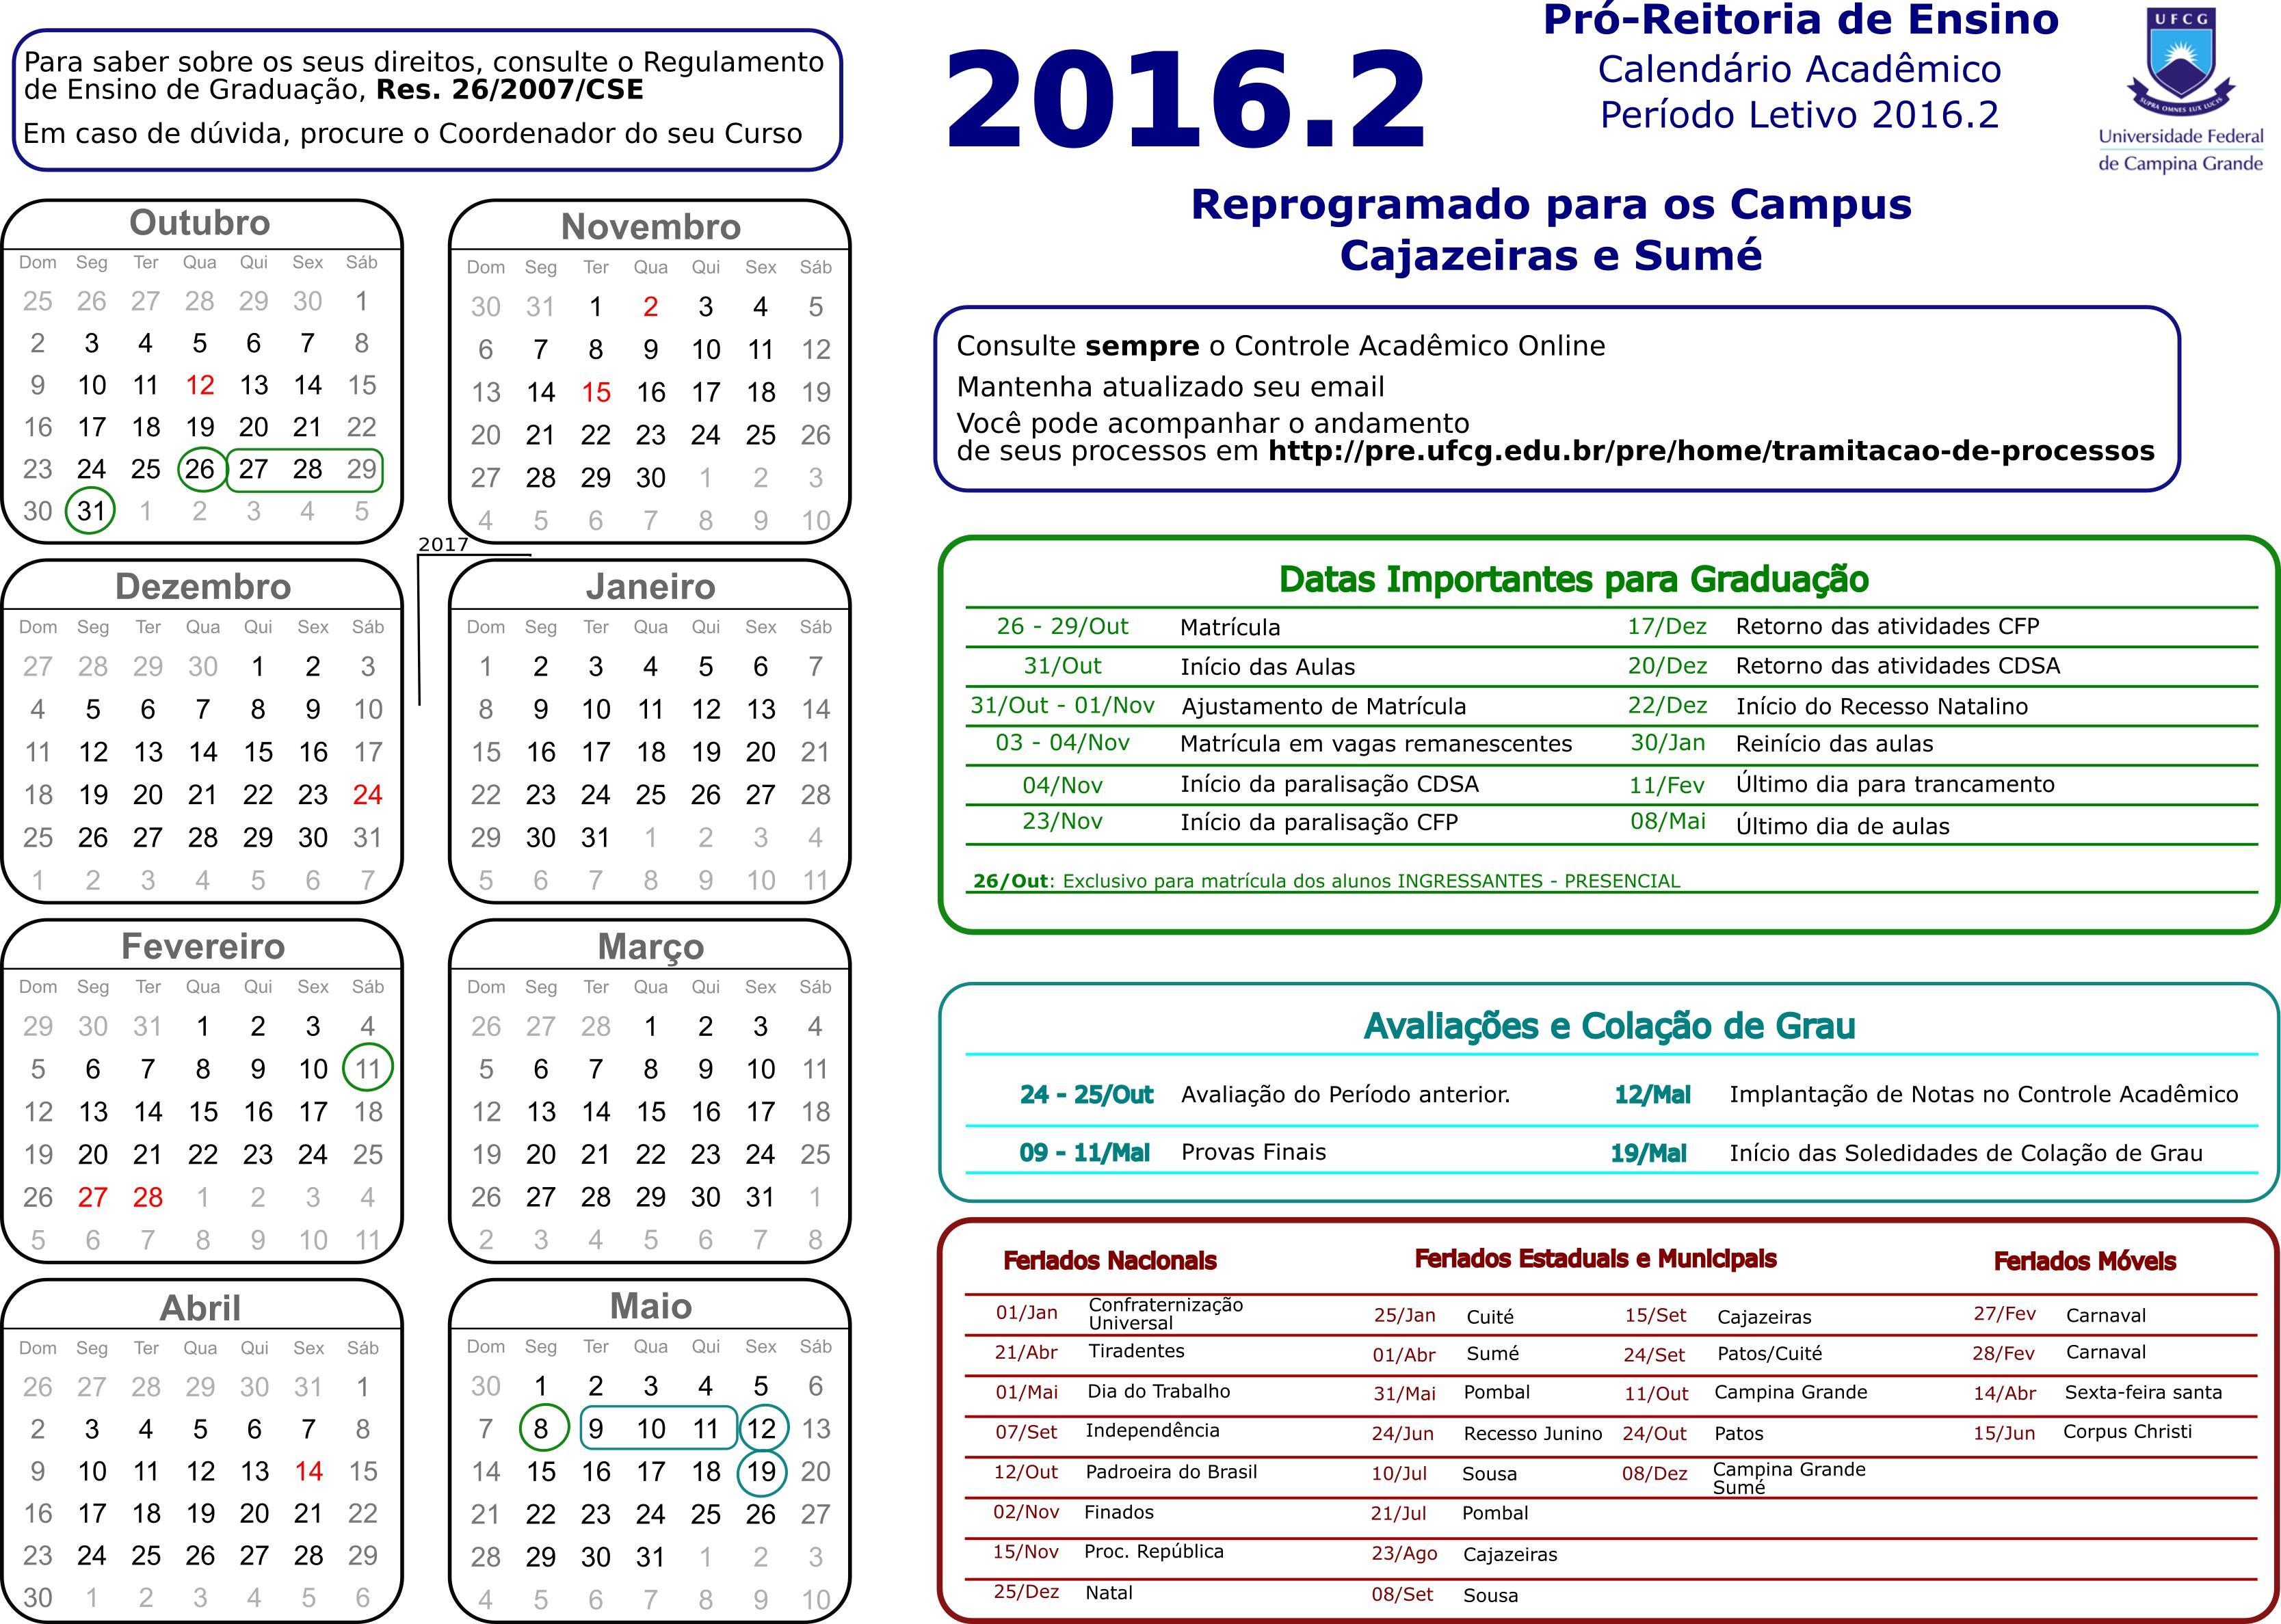 Calendário Acadªmico 2016 2 Campus de Cajazeiras e Sumé